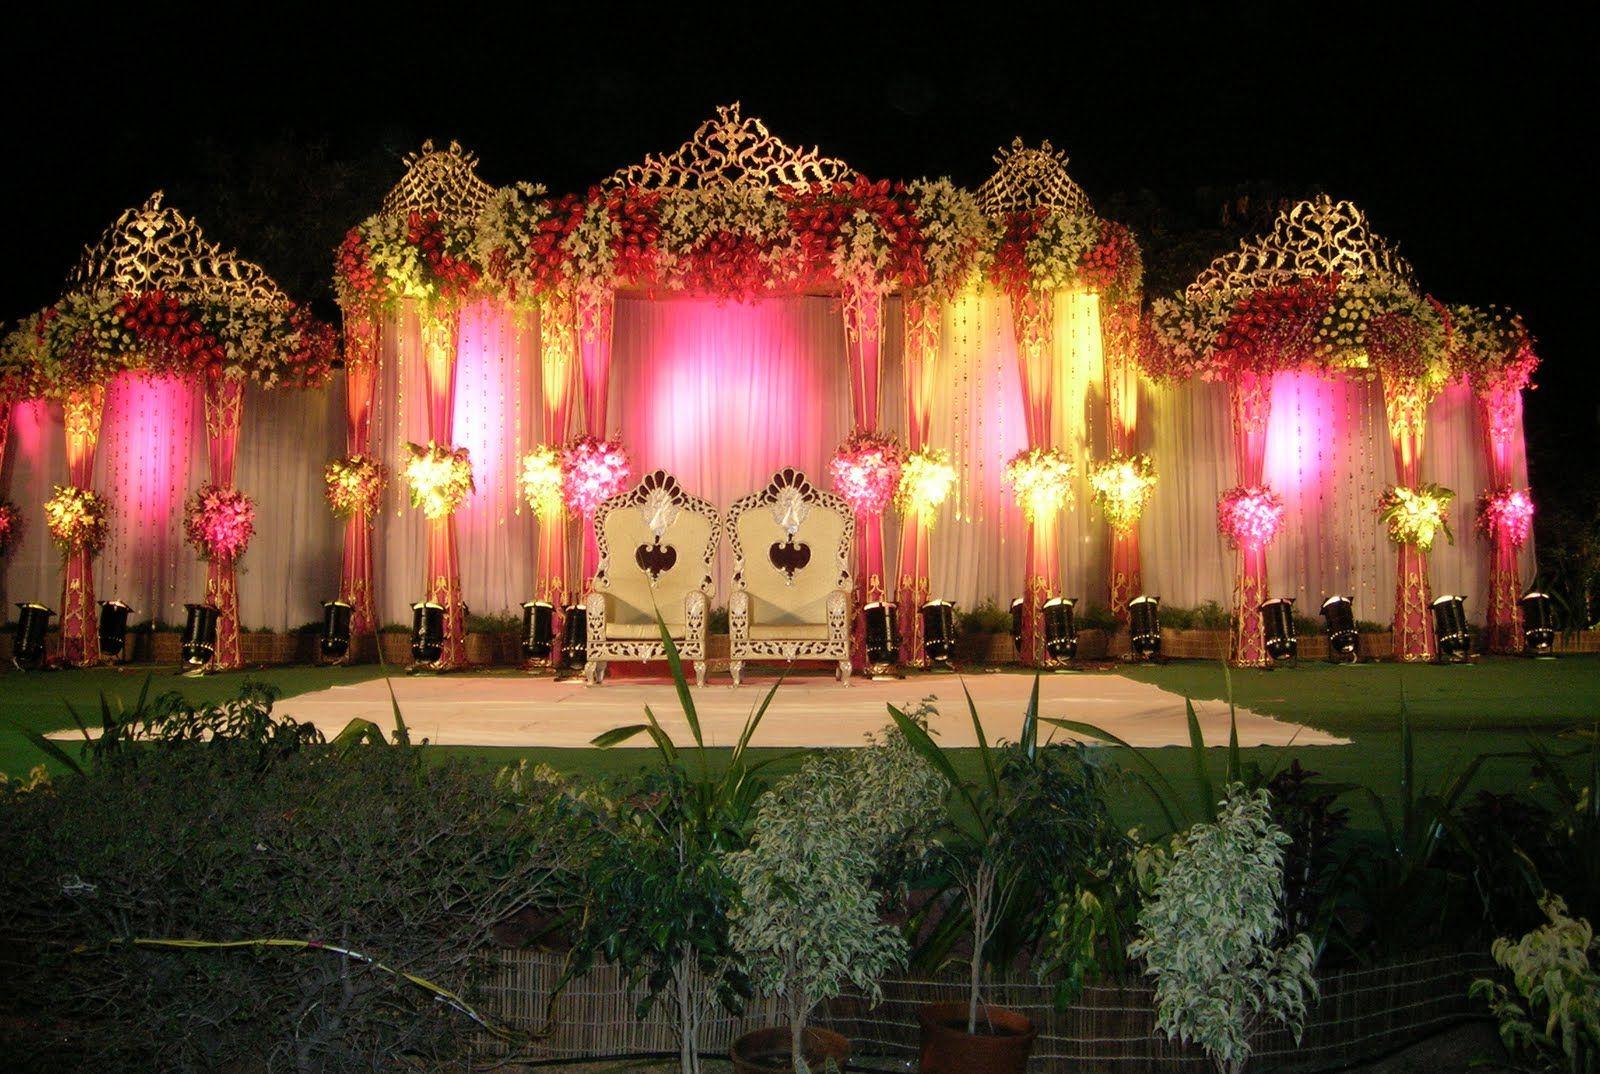 Outdoor Indian Wedding Stage Decorations | Wedding ...